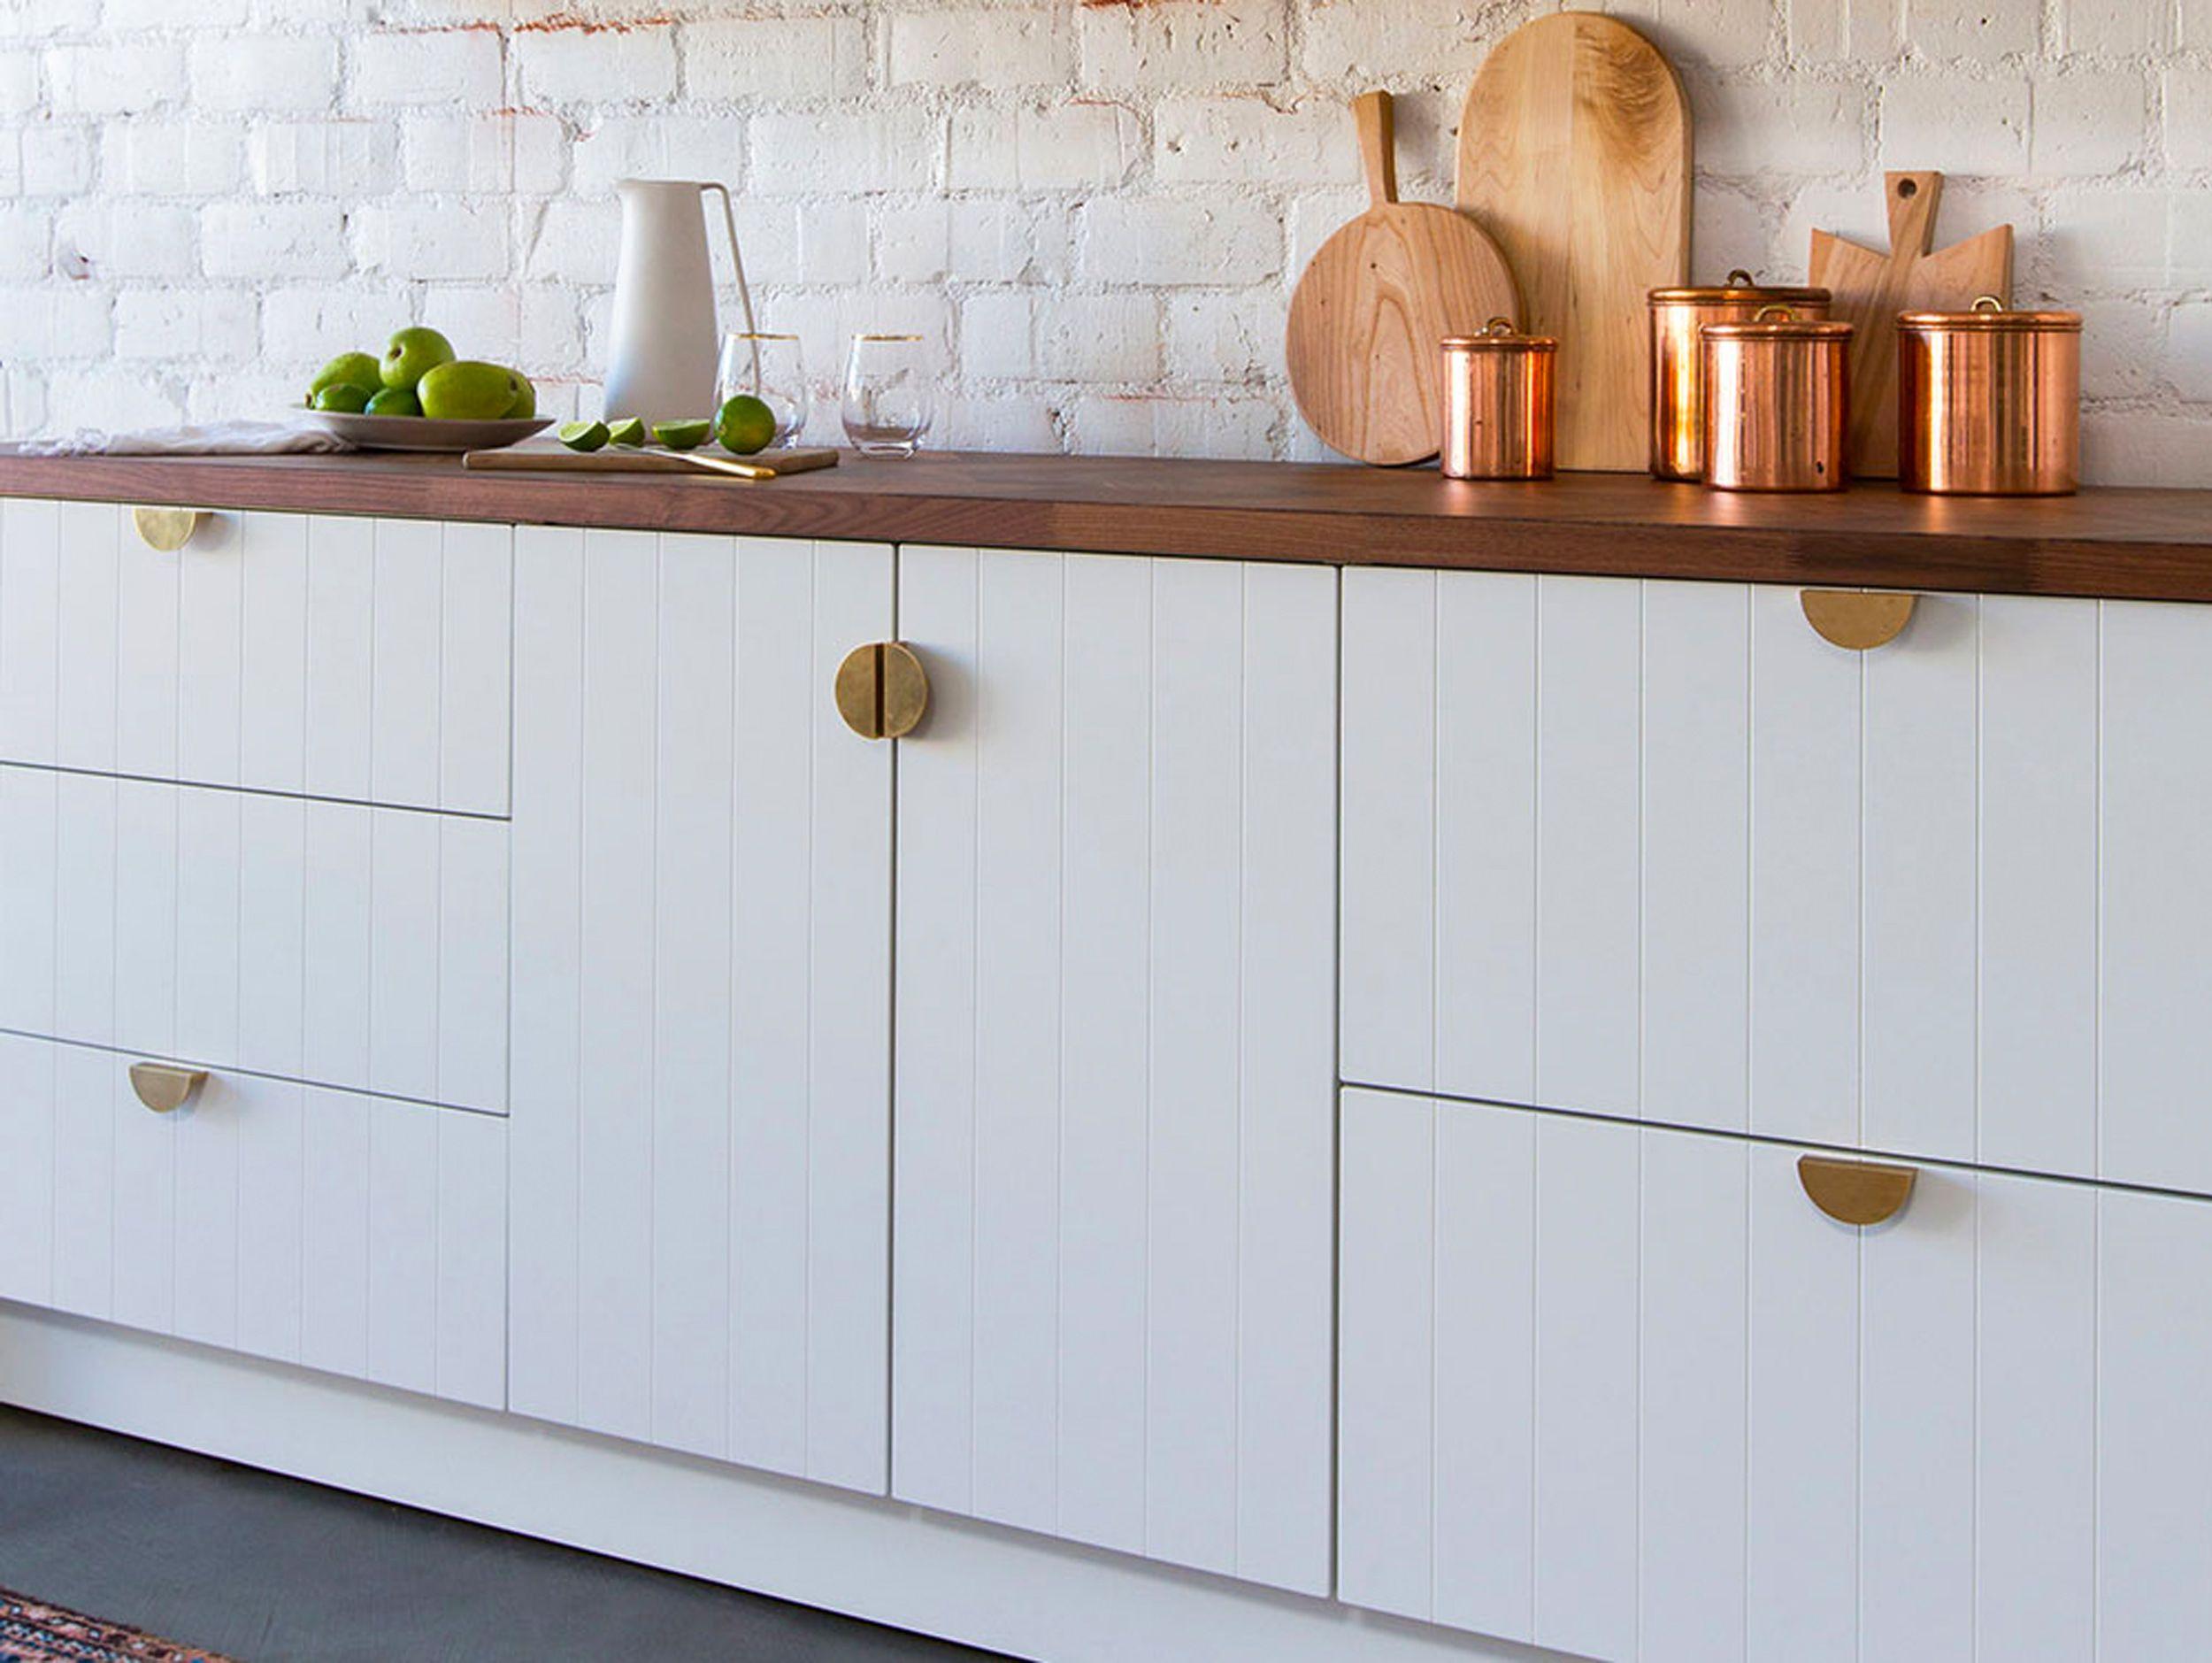 Mountain Fixer The Kitchen Cabinet Evolution Home Decor Kitchen